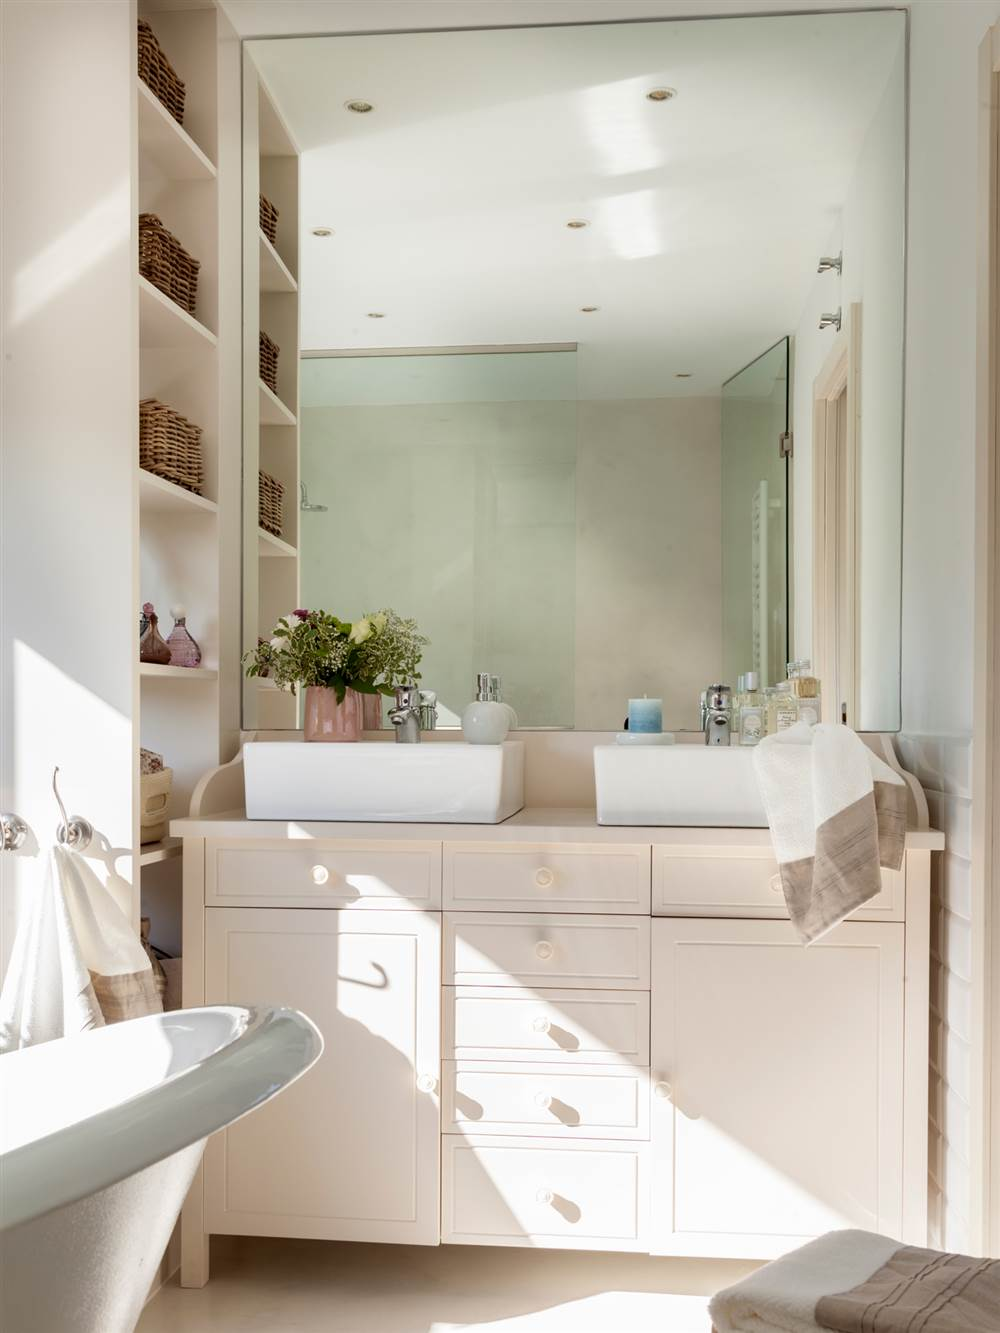 Muebles perfectos para ba os peque os for Muebles bano rusticos ikea